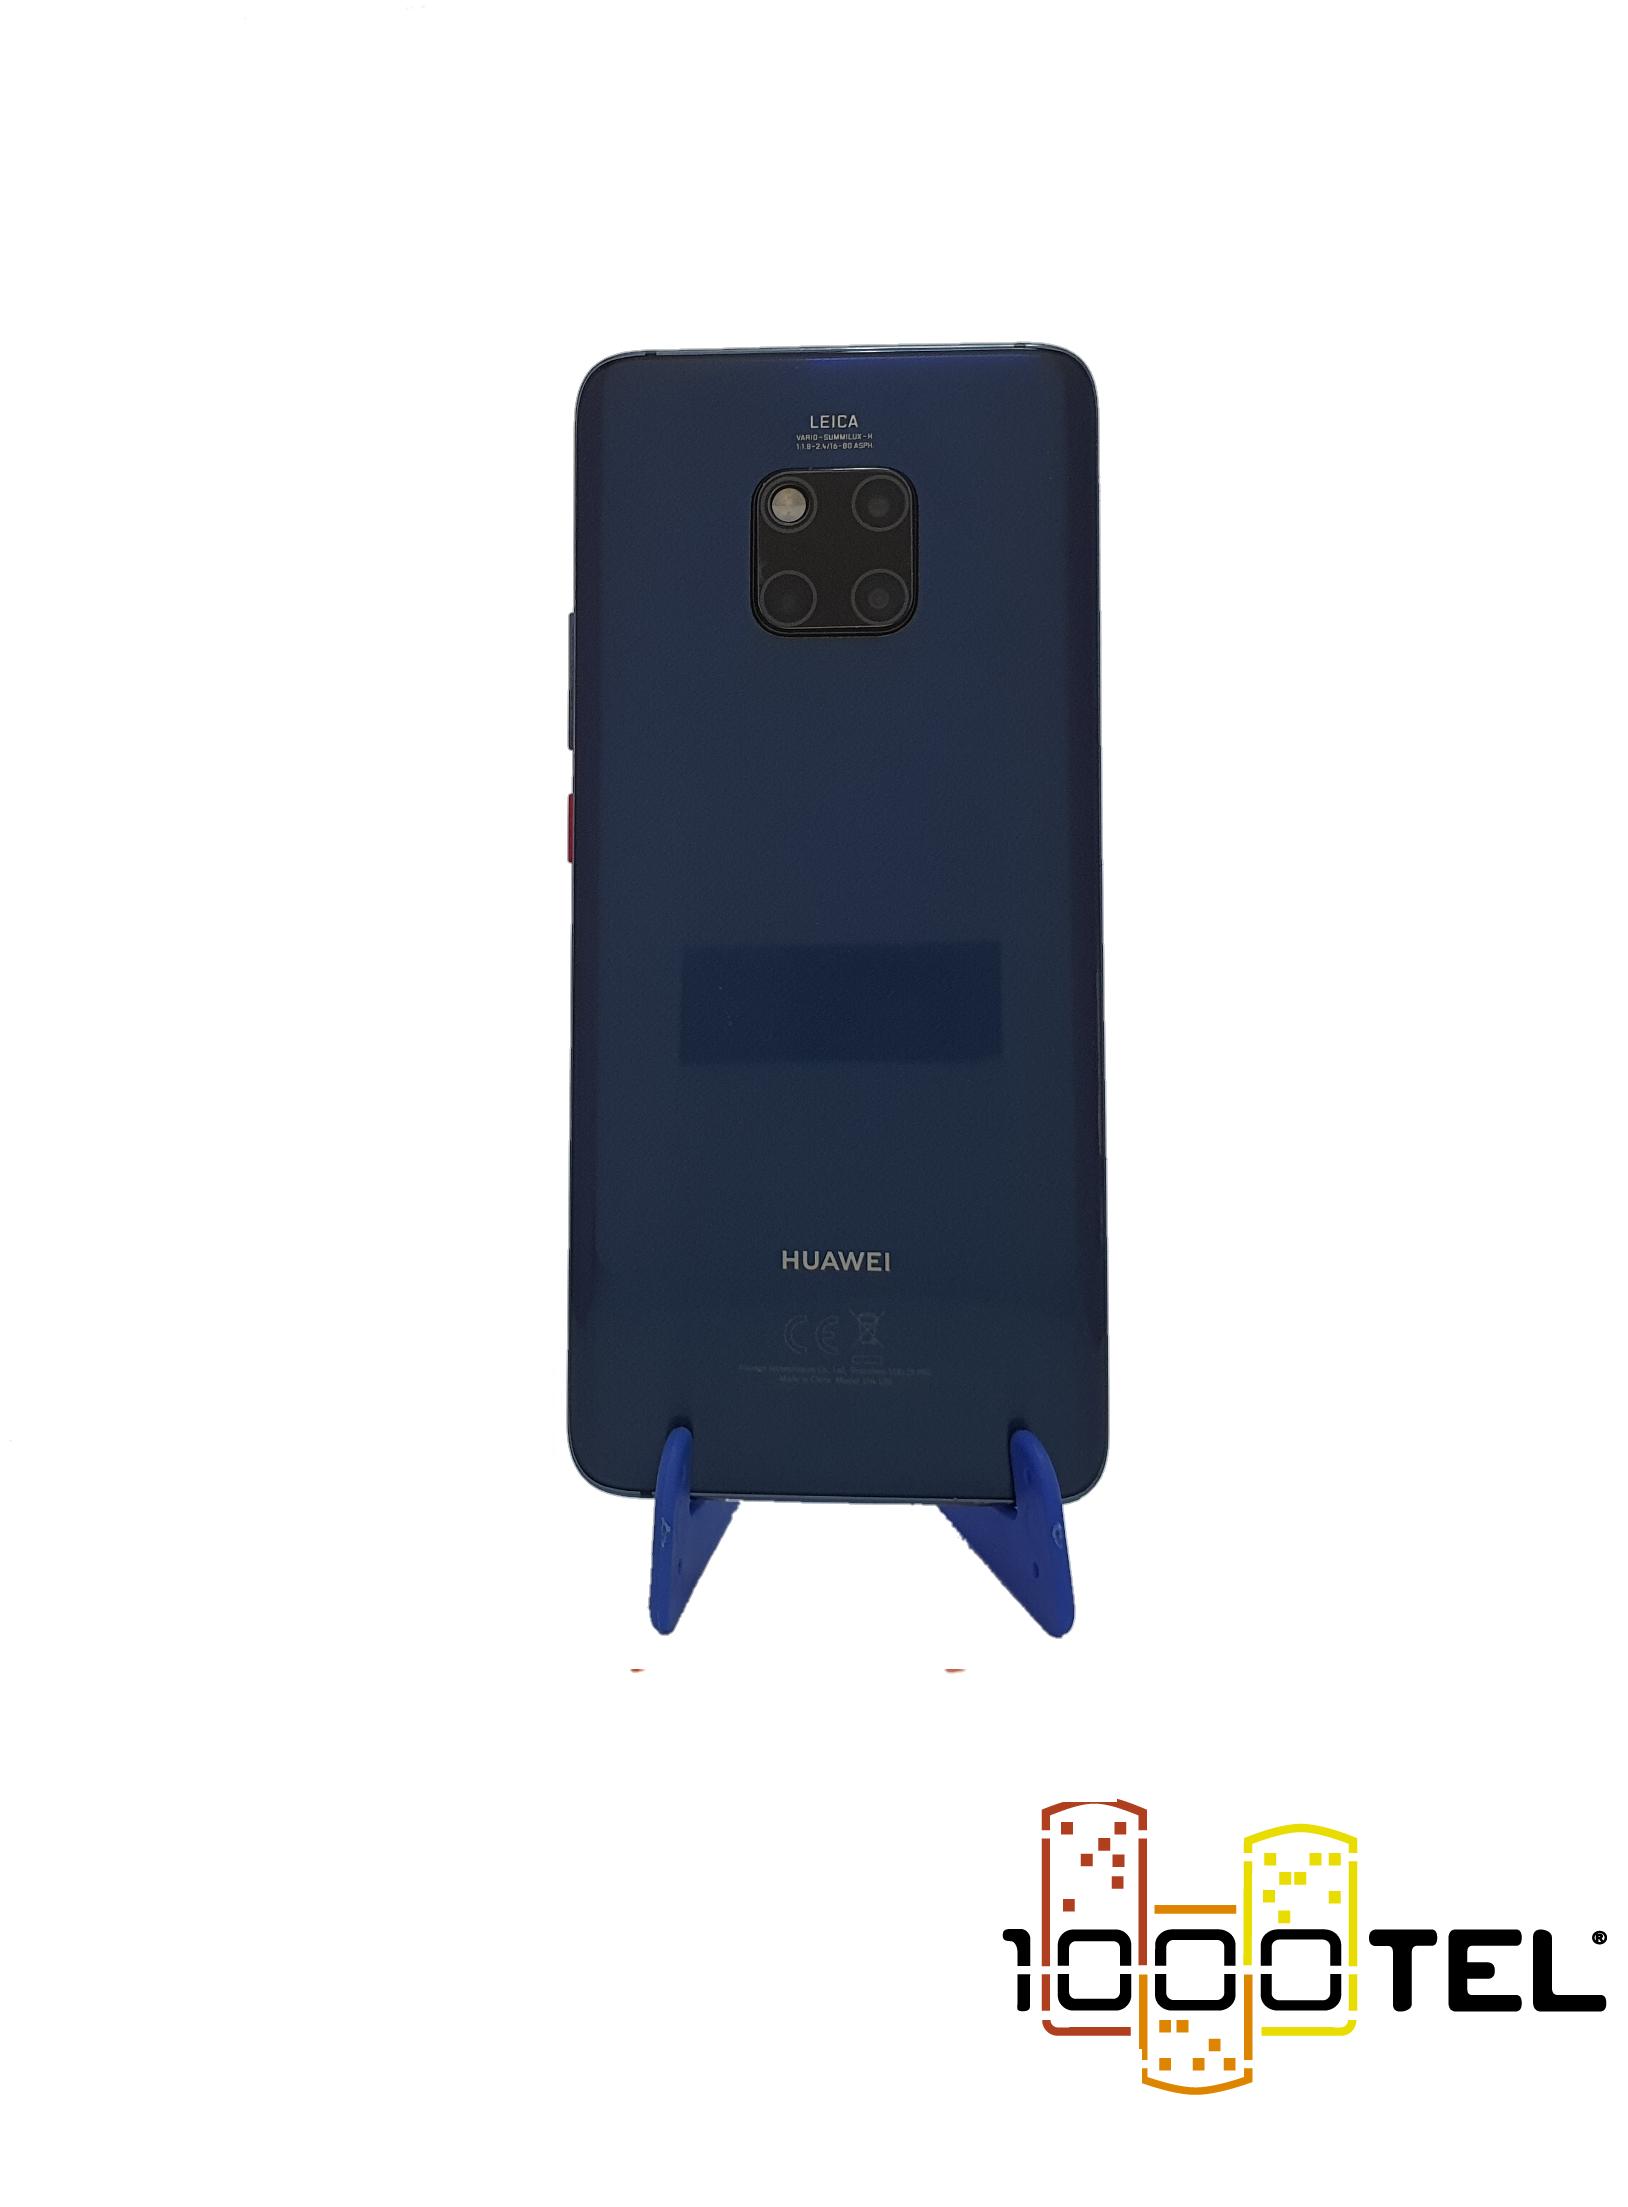 Huawei Mate 20 Pro #2